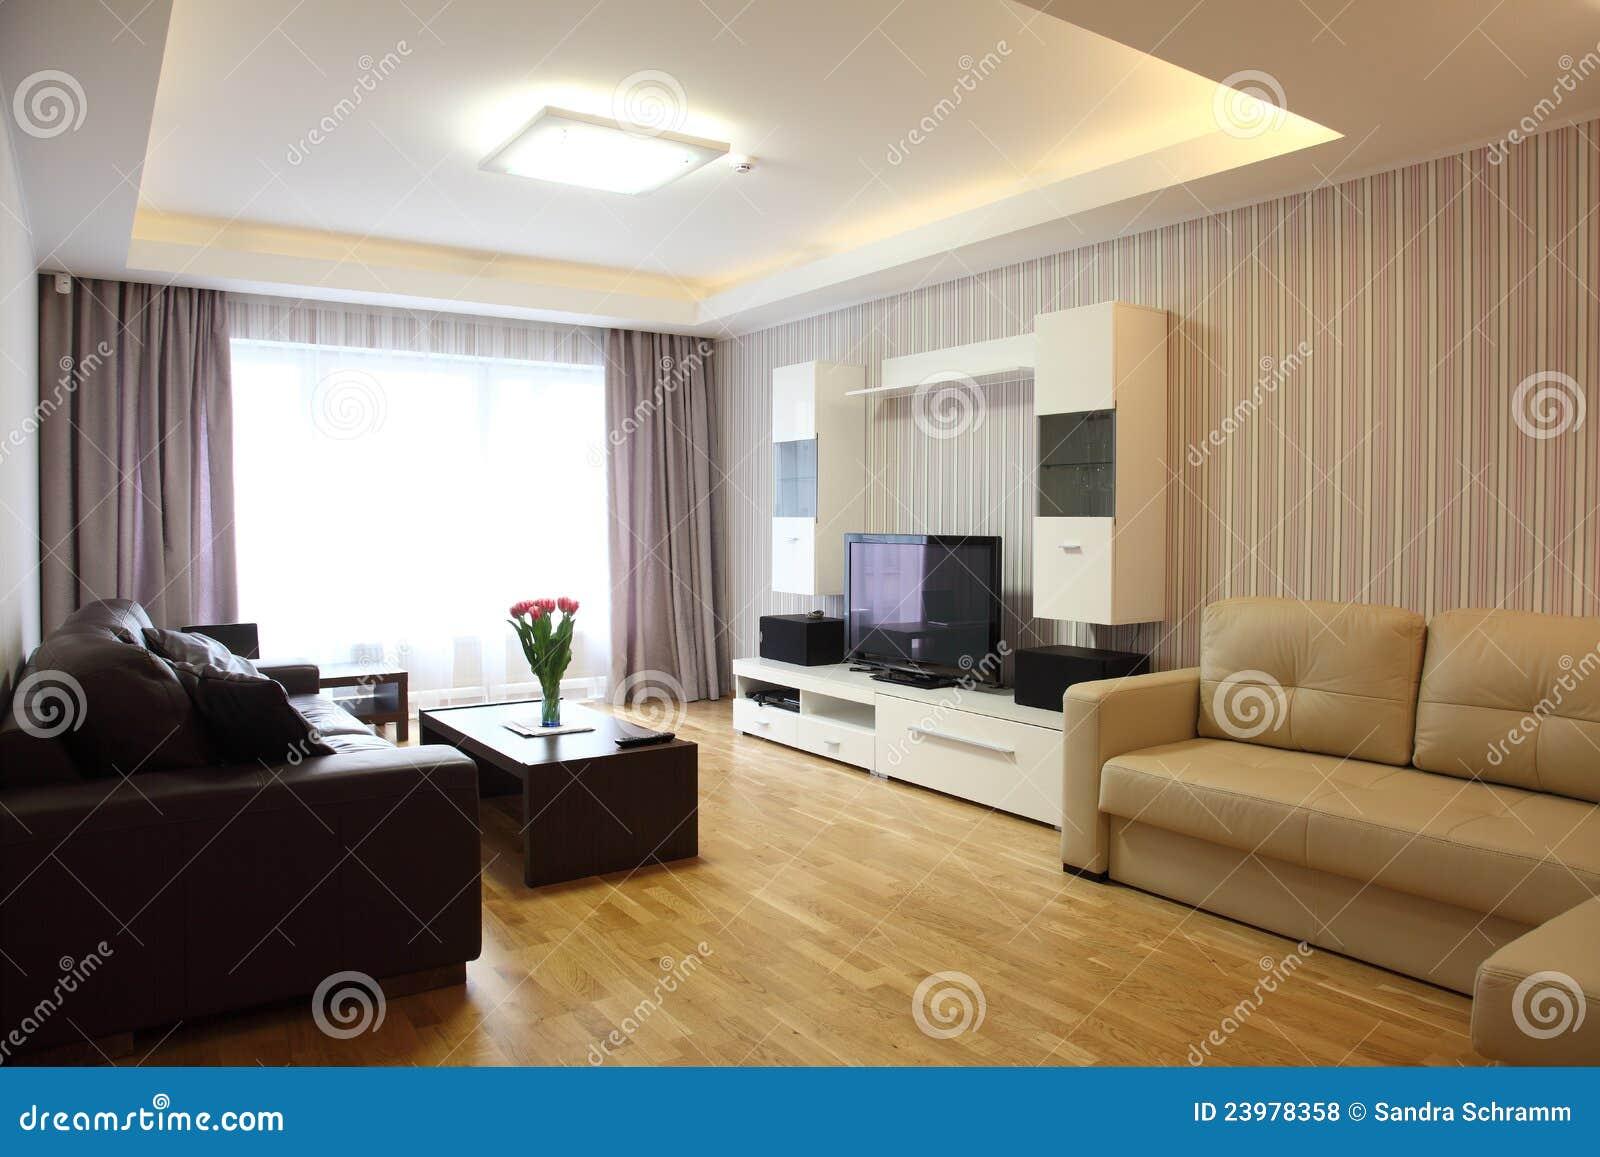 Moderne woonkamer royalty vrije stock foto's   afbeelding: 23978358